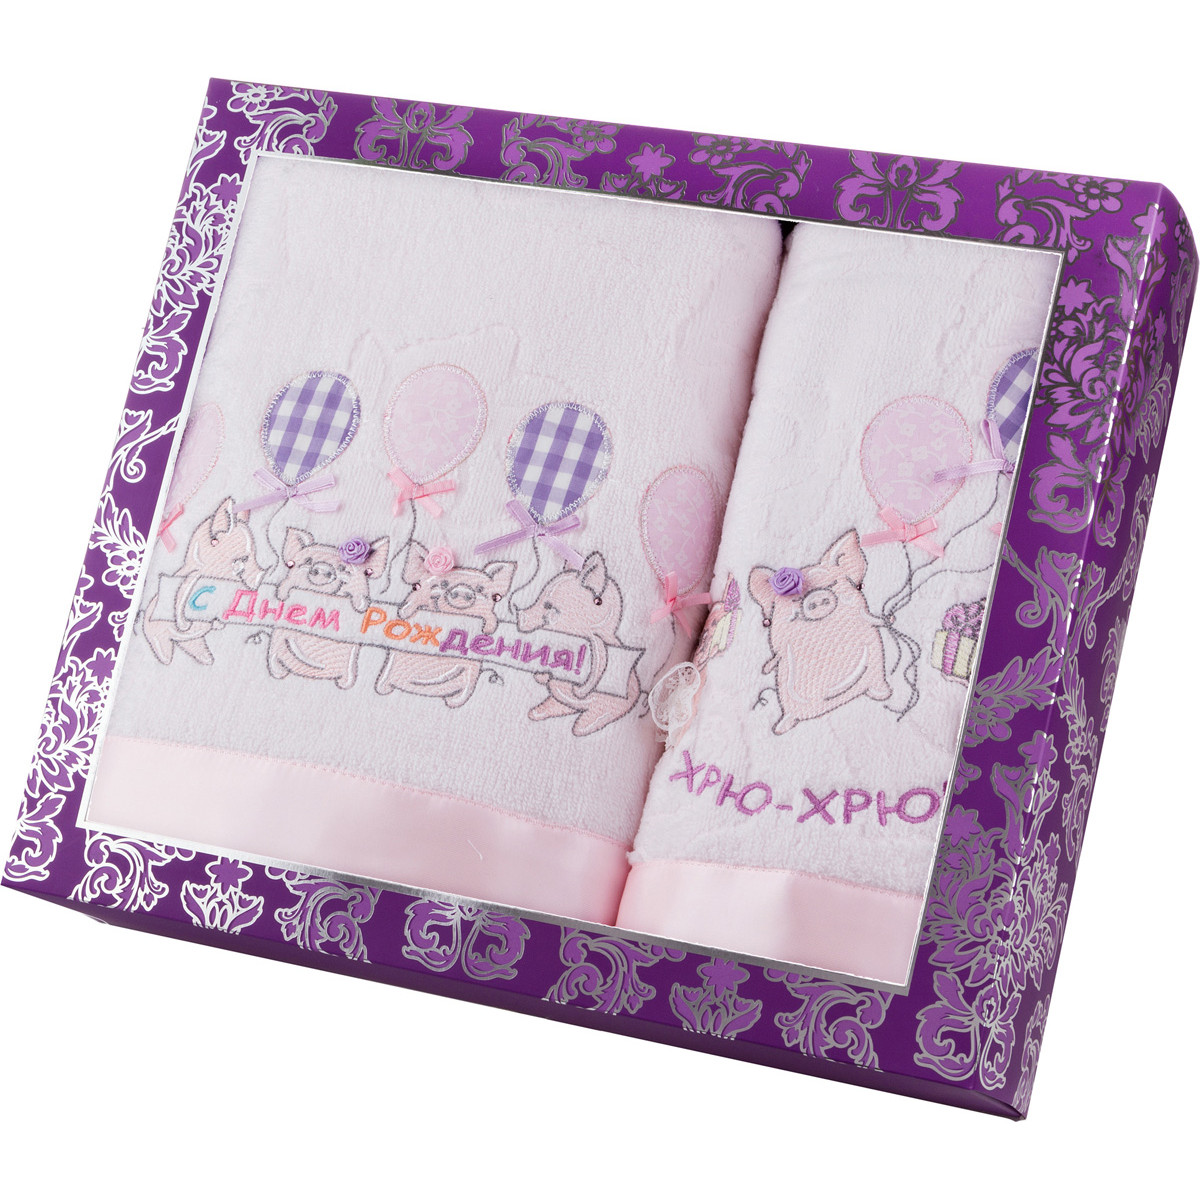 Полотенца Santalino Детское полотенце Brayden  (40х70 см,70х140 см) полотенца santalino полотенце shulamite 40х70 см